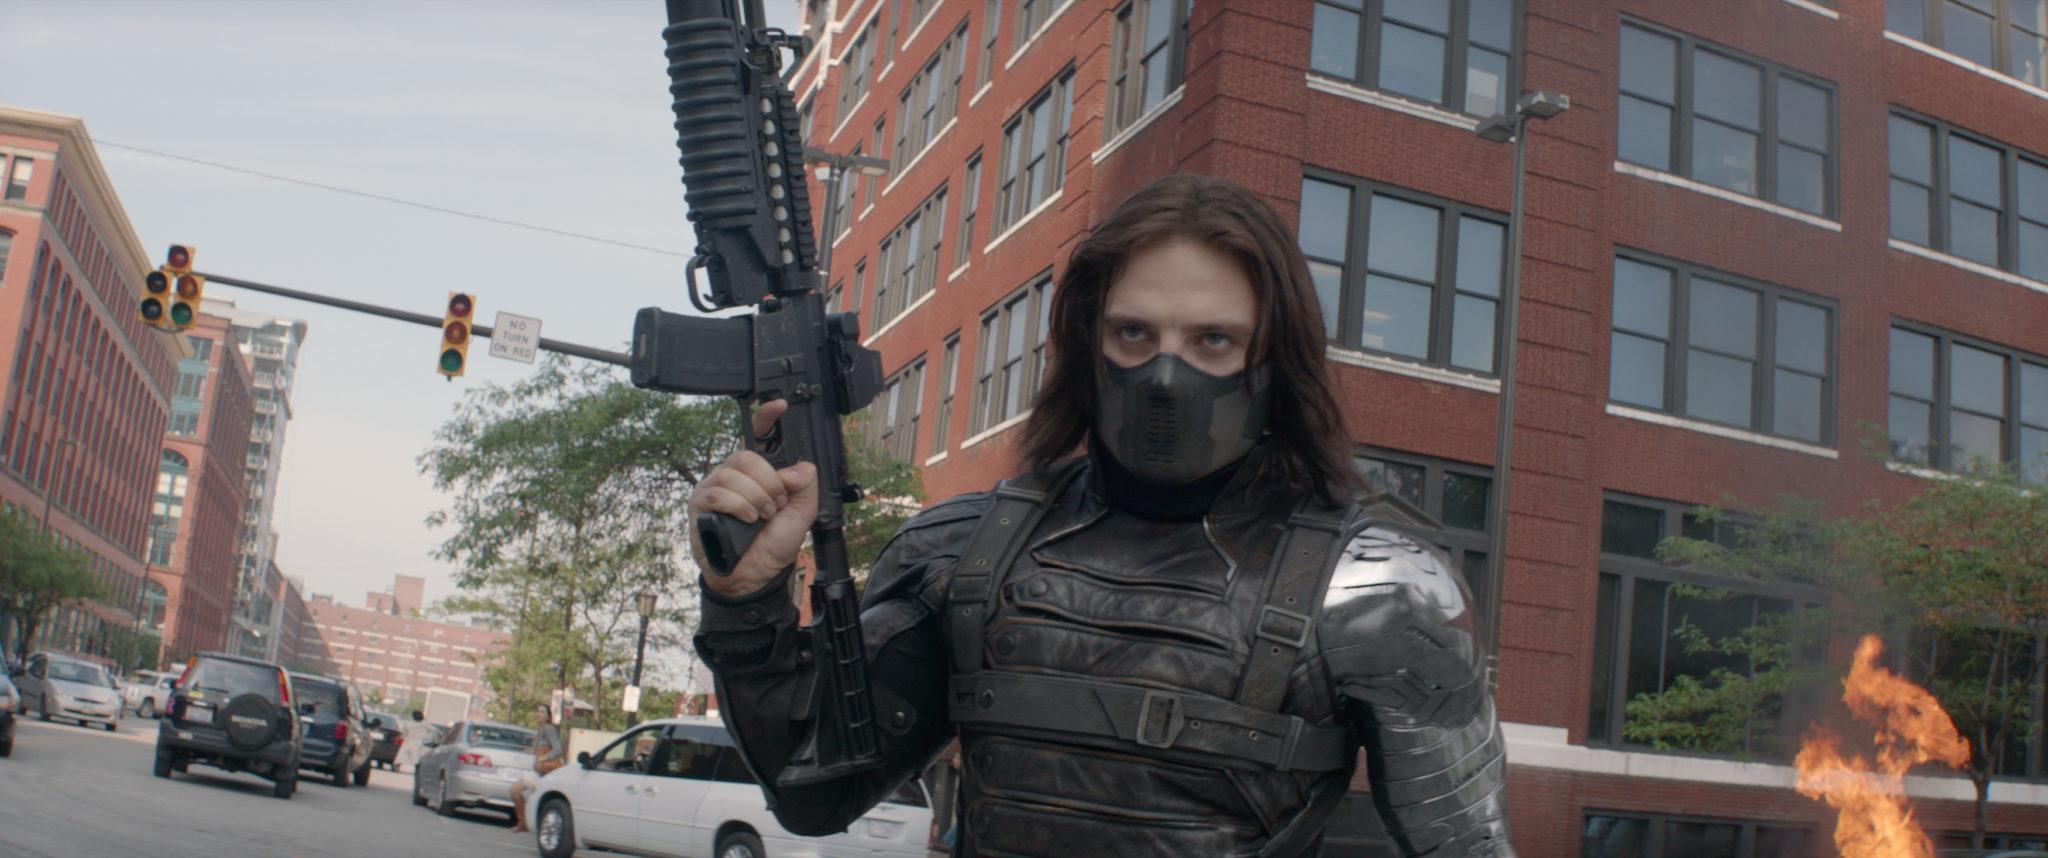 The Winter Soldier Sebastian Stan